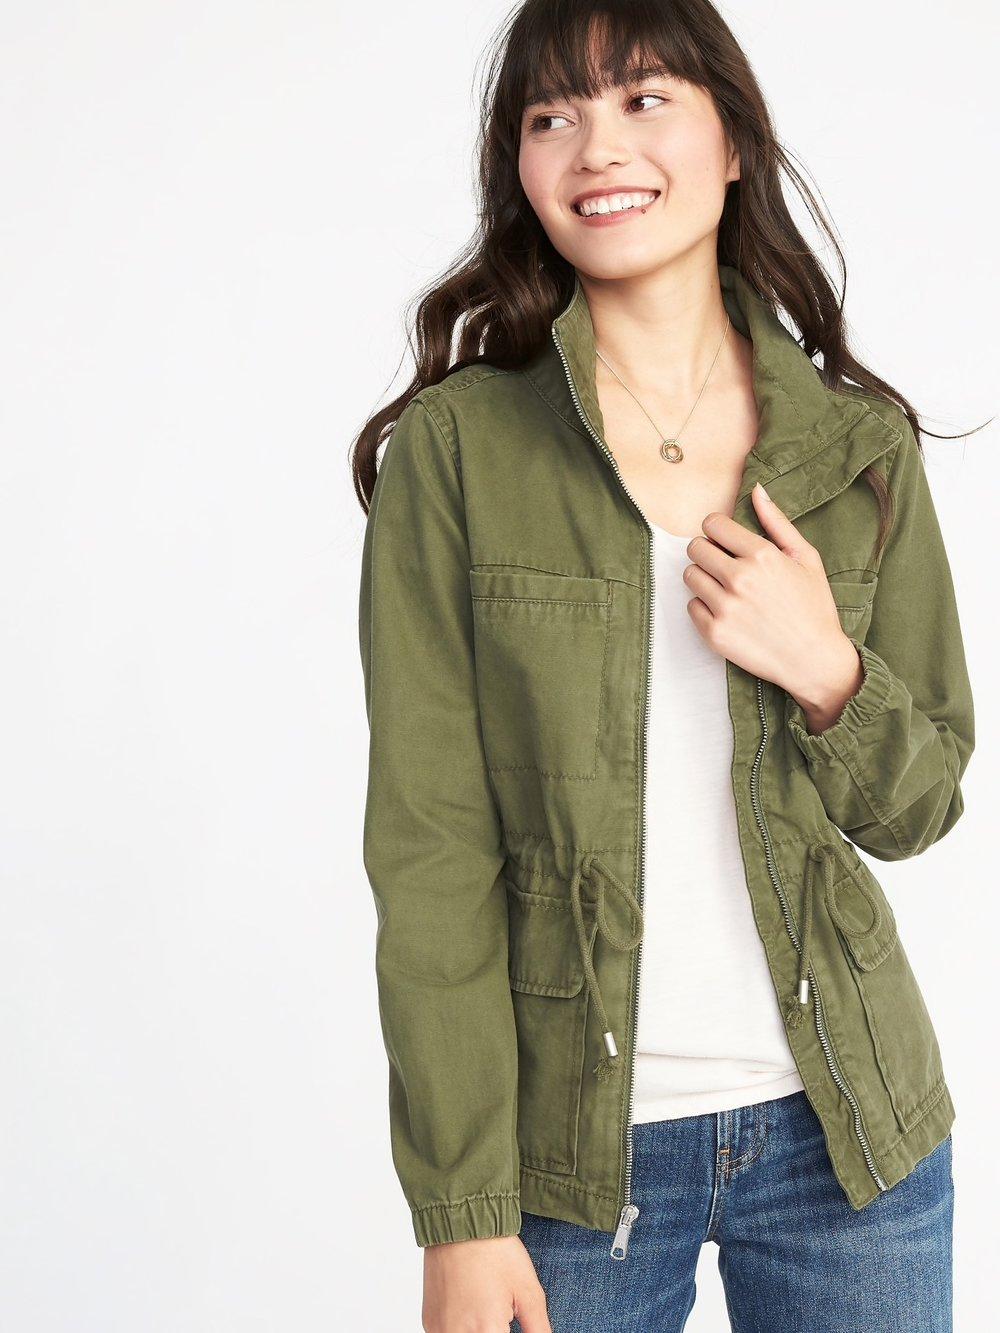 green spring jacket.jpg